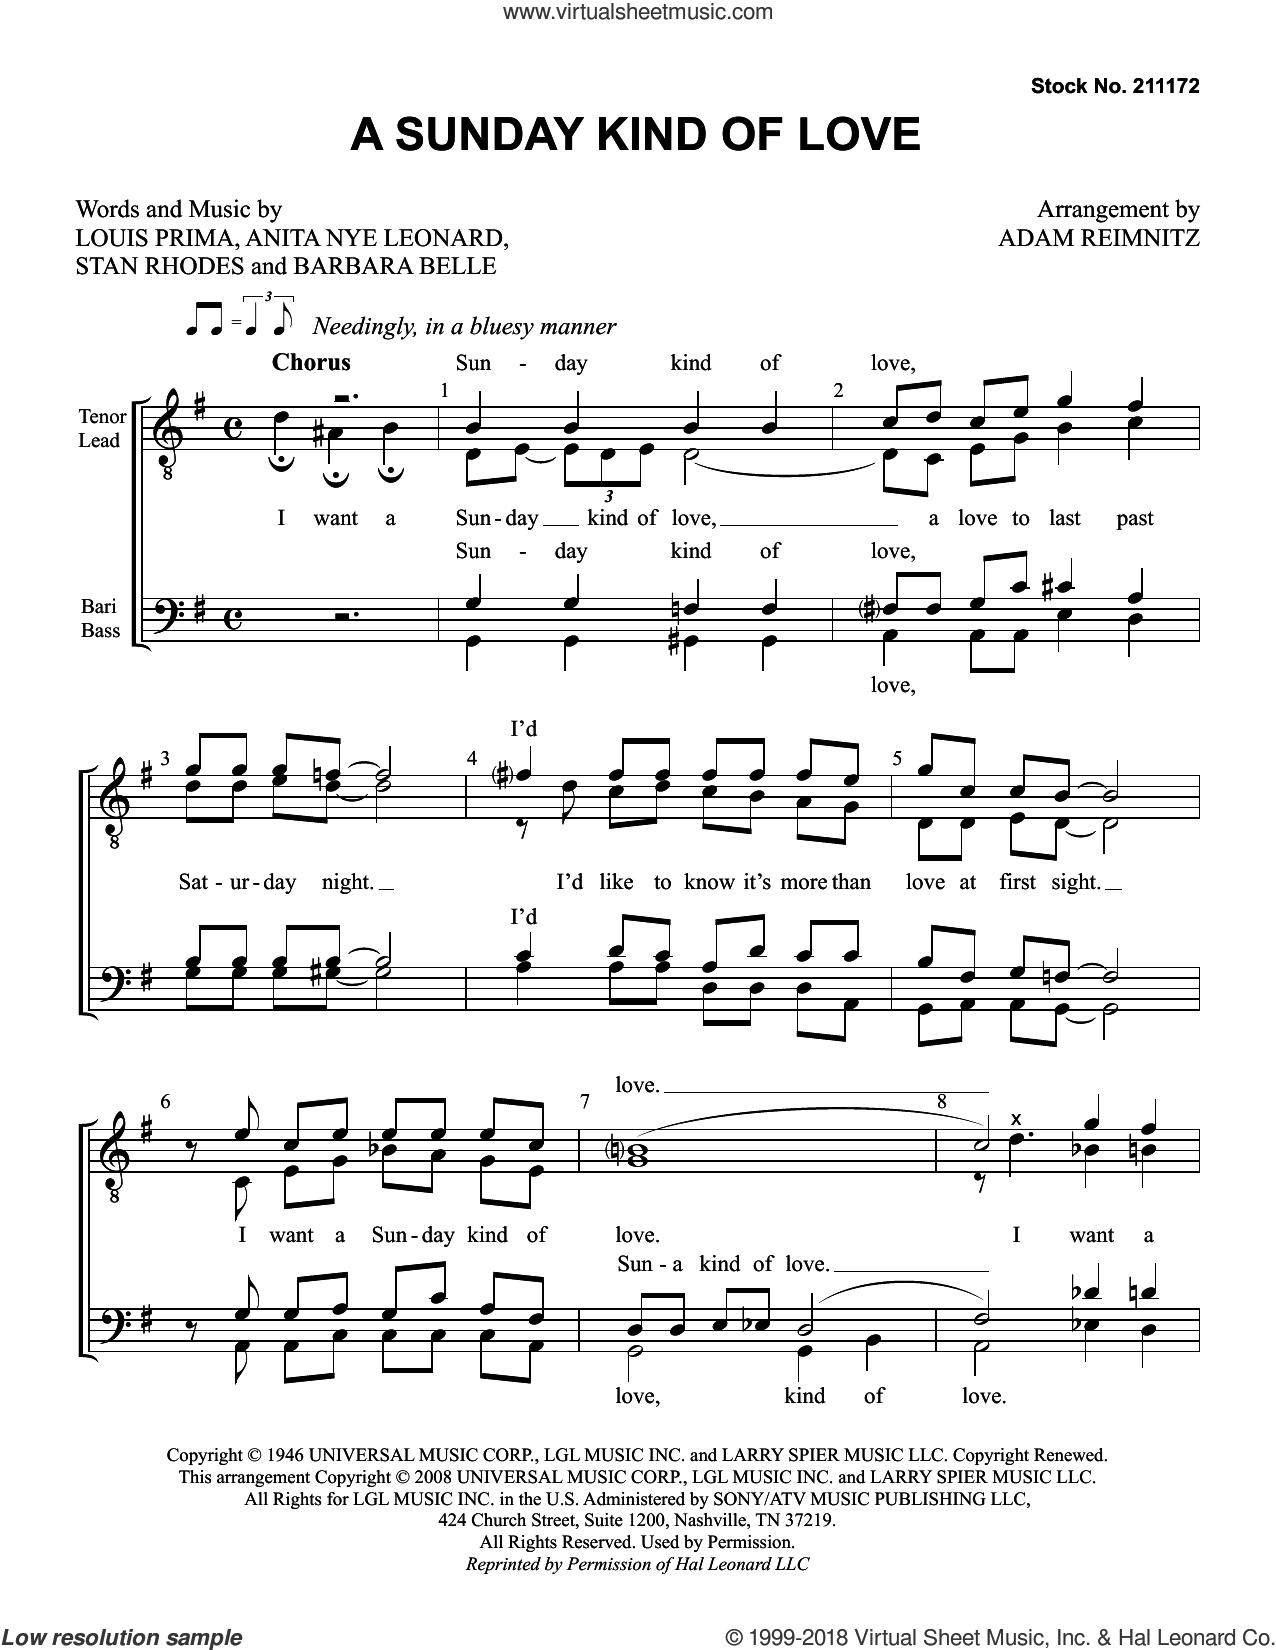 A Sunday Kind of Love (arr. Adam Reimnitz) sheet music for choir (TTBB: tenor, bass) by Etta James, Adam Reimnitz, Anita Nye Leonard, Barbara Belle, Louis Prima and Stanley Rhodes, intermediate skill level